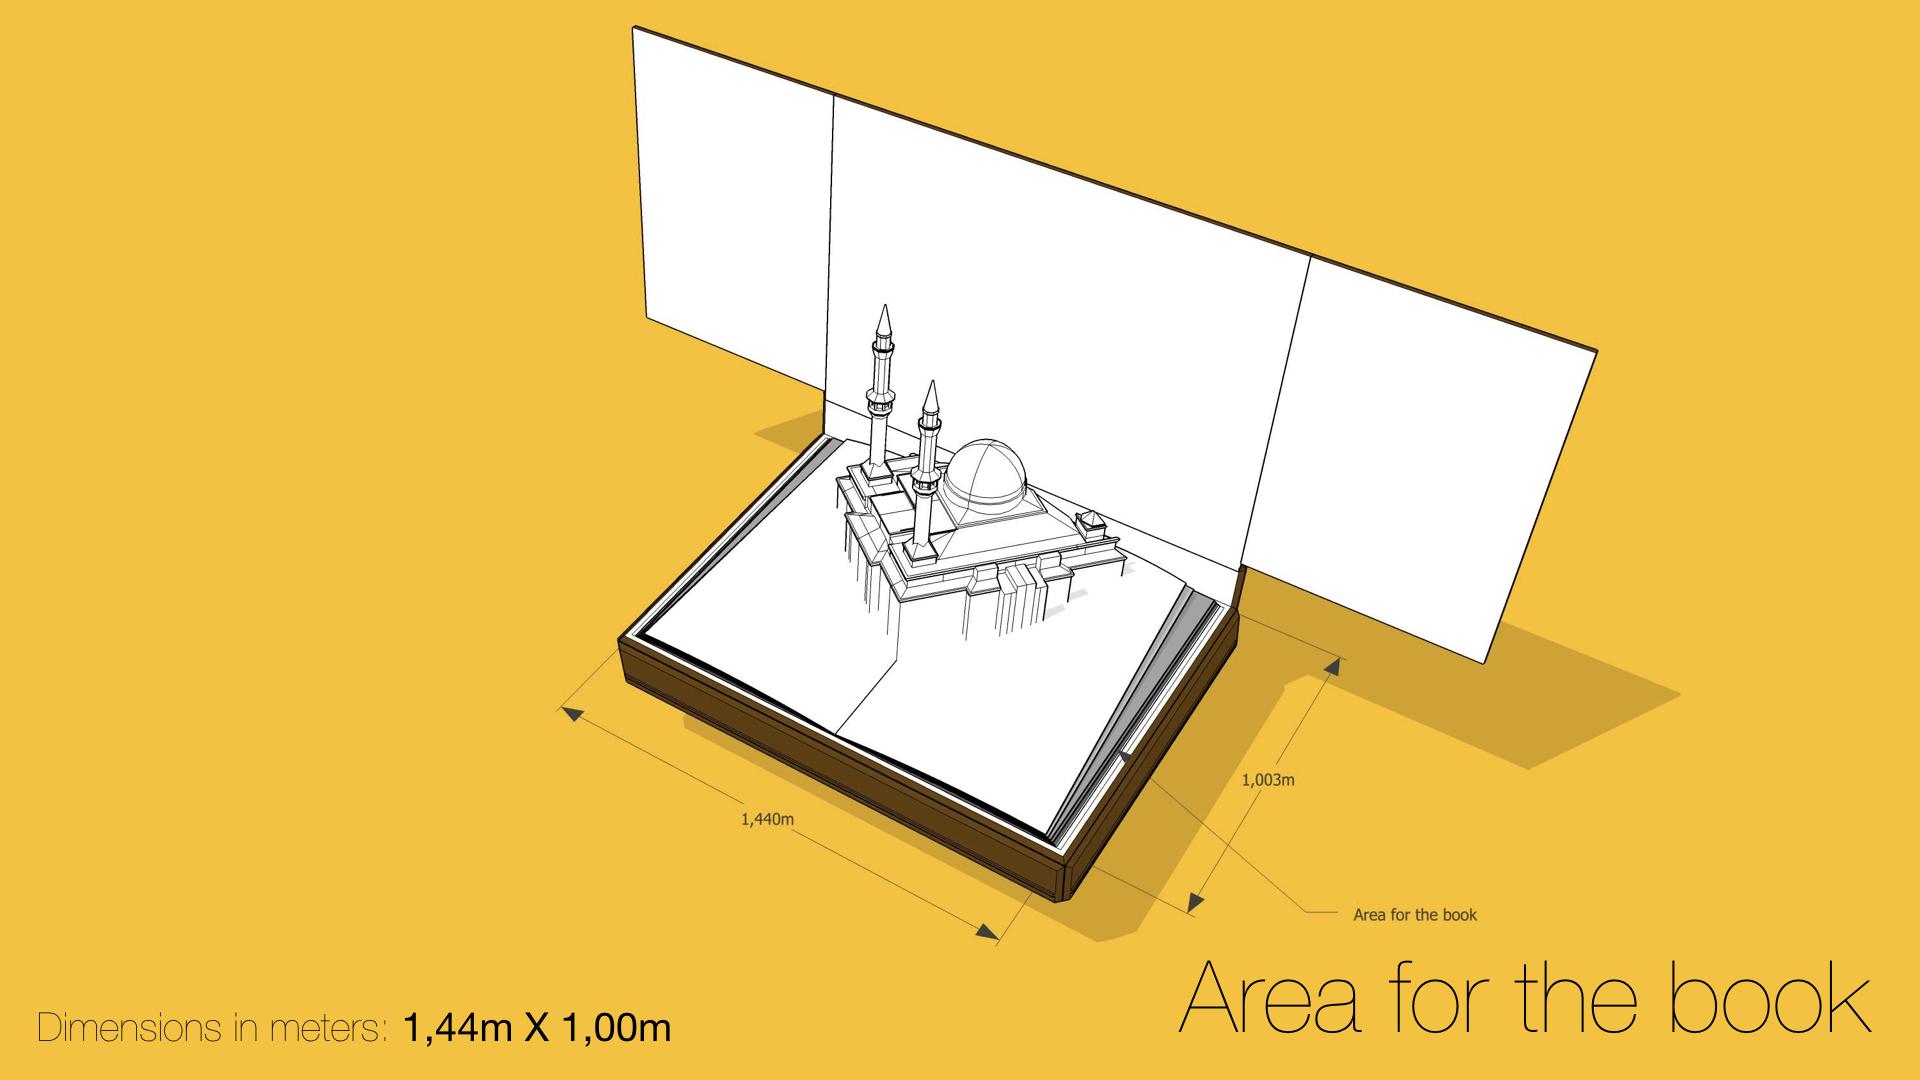 US-14002_CMOM_3DSketch_box_book_study_140618_v2.016.jpeg